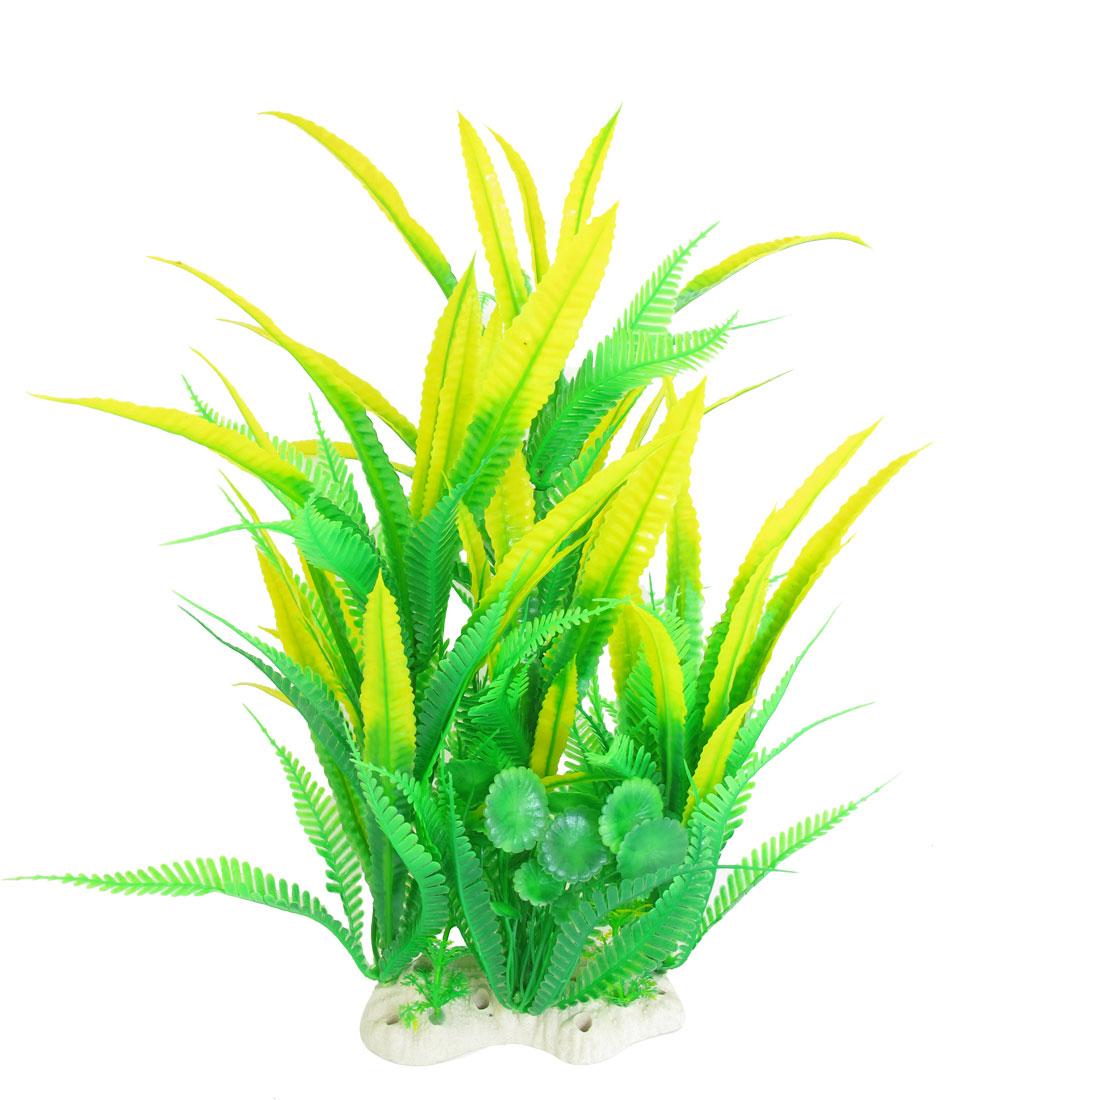 Unique Bargains Aquarium Fish Tank Artificial Water Grass Plant Decor 36cm High Green Yellow